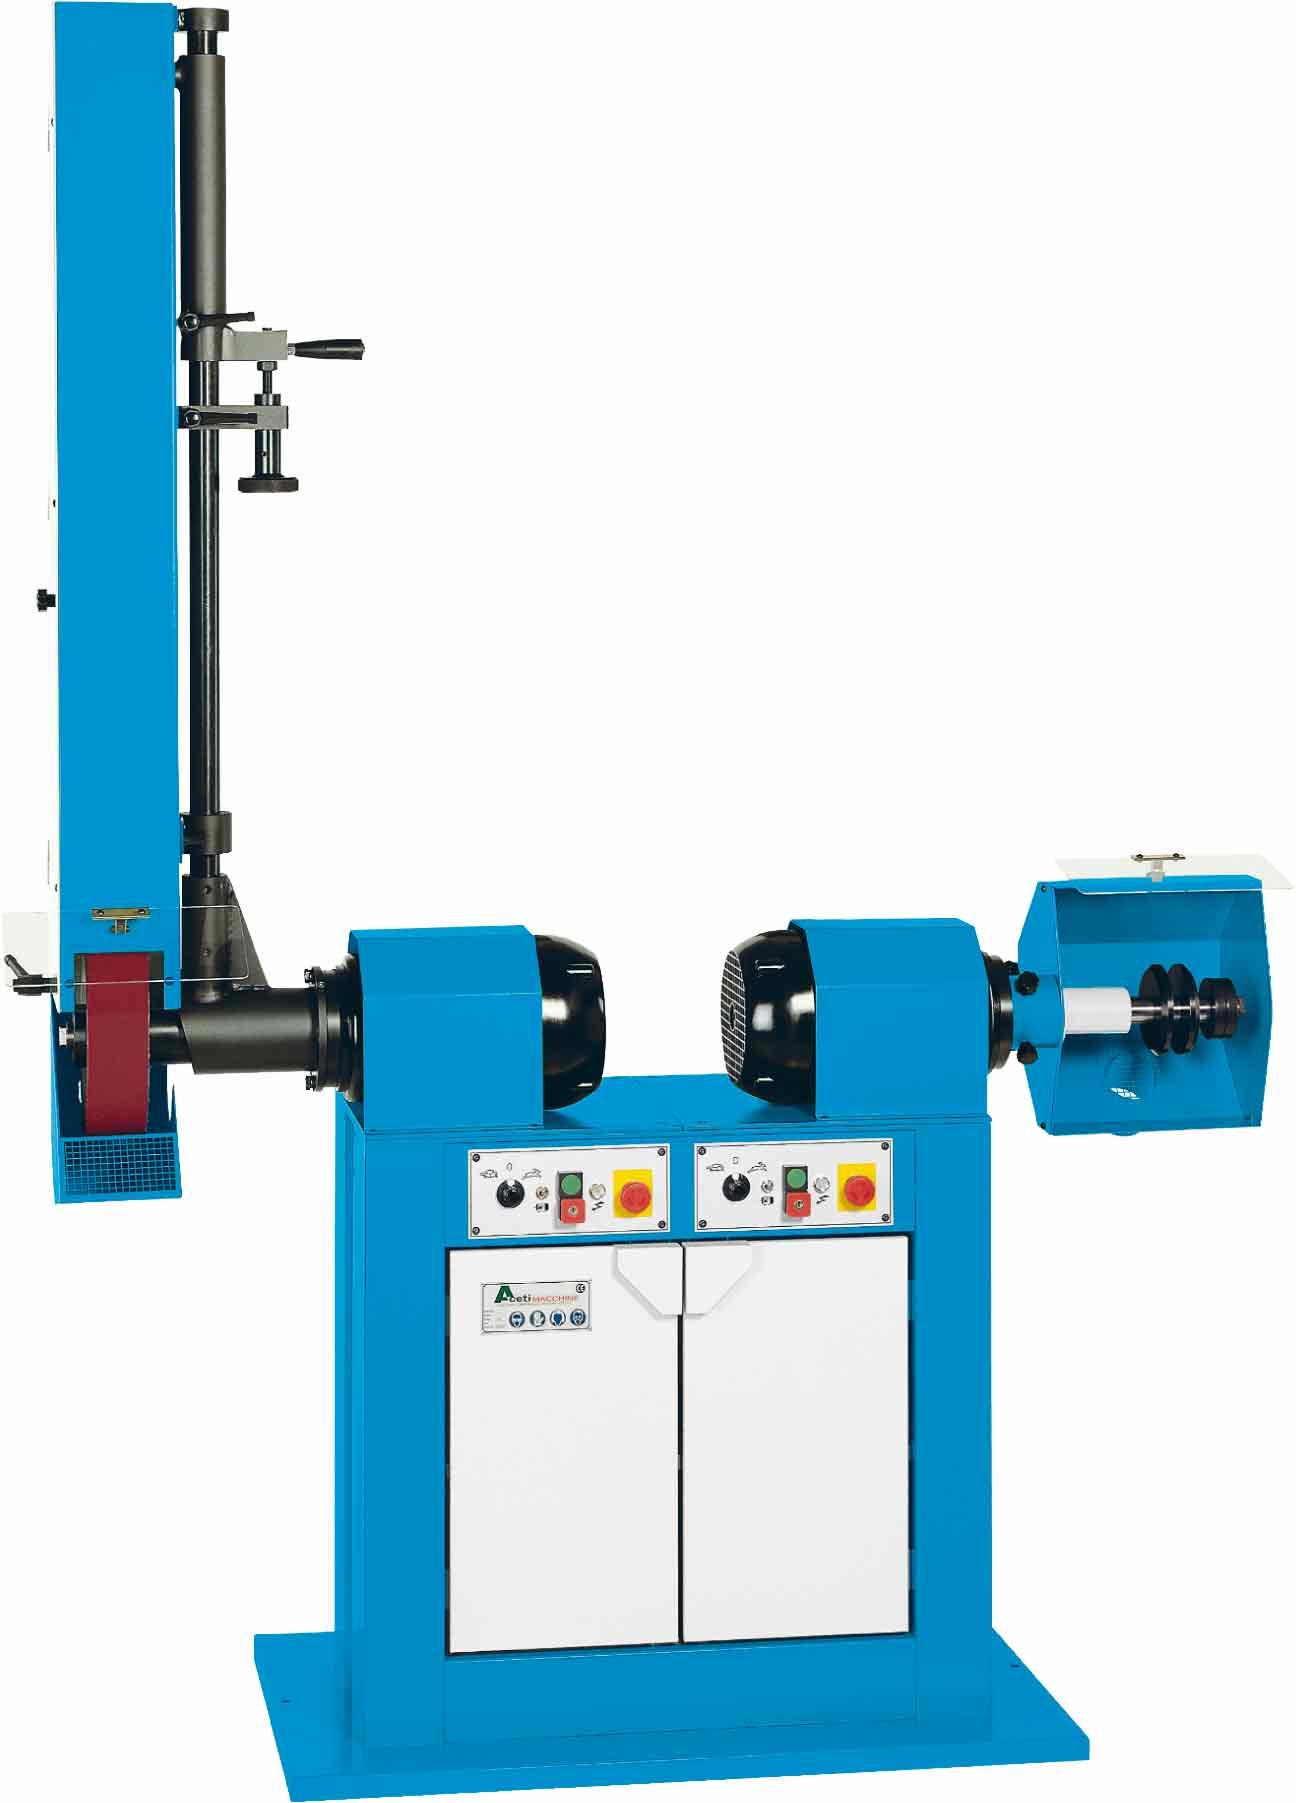 ART.70 - Belt grinding machine